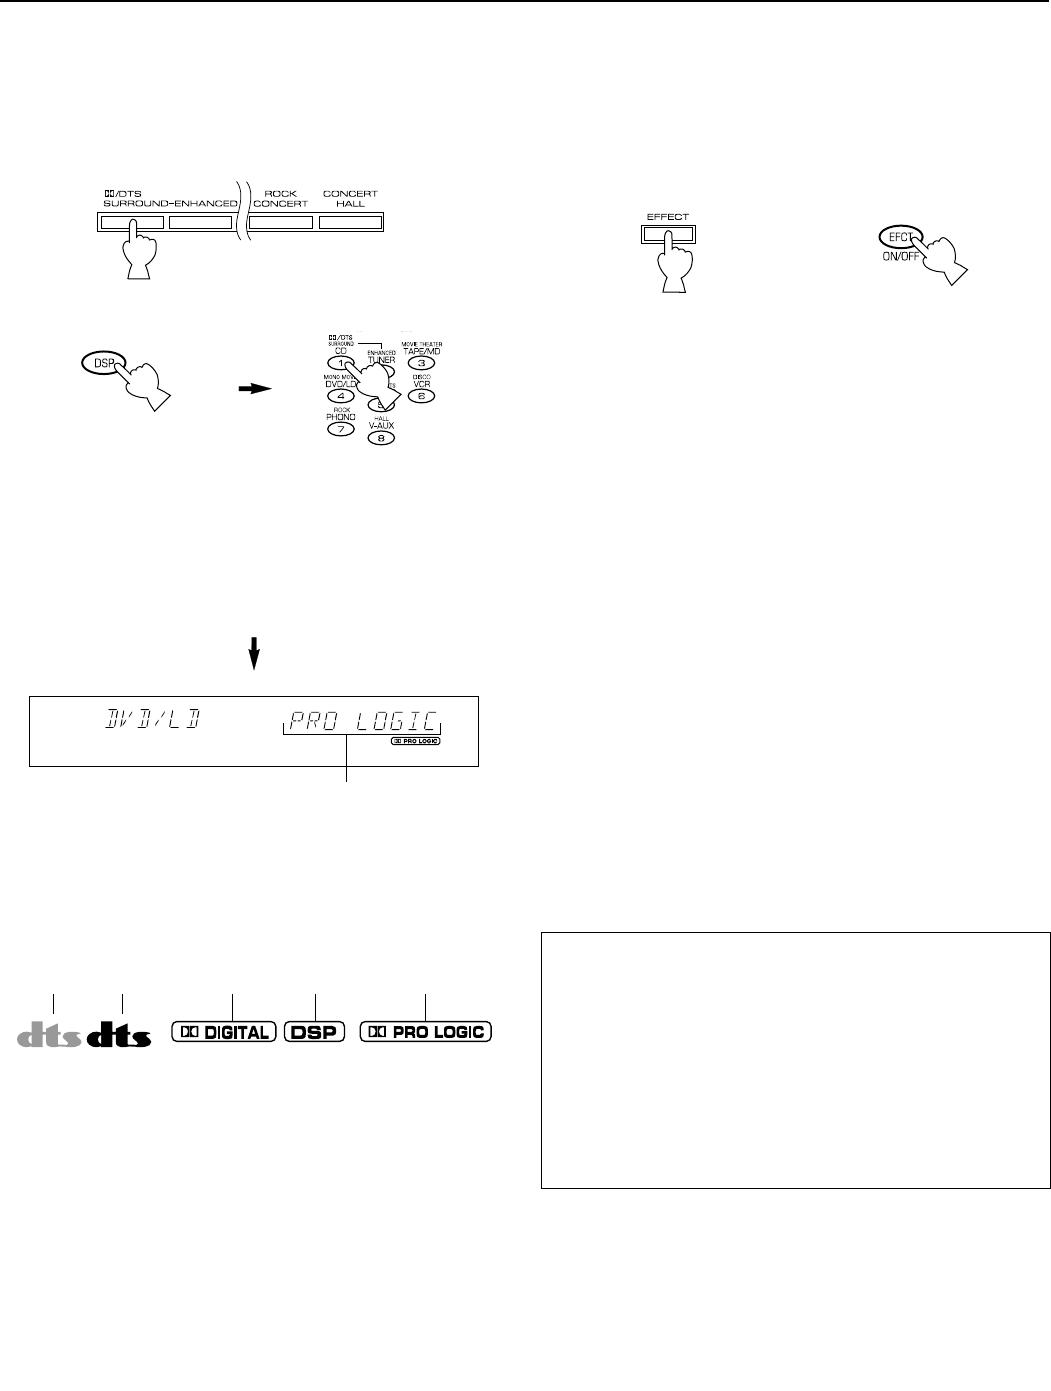 Yamaha Dsp A595a Owners Manual 01dsp 1 Logic Combi 30 Diagram